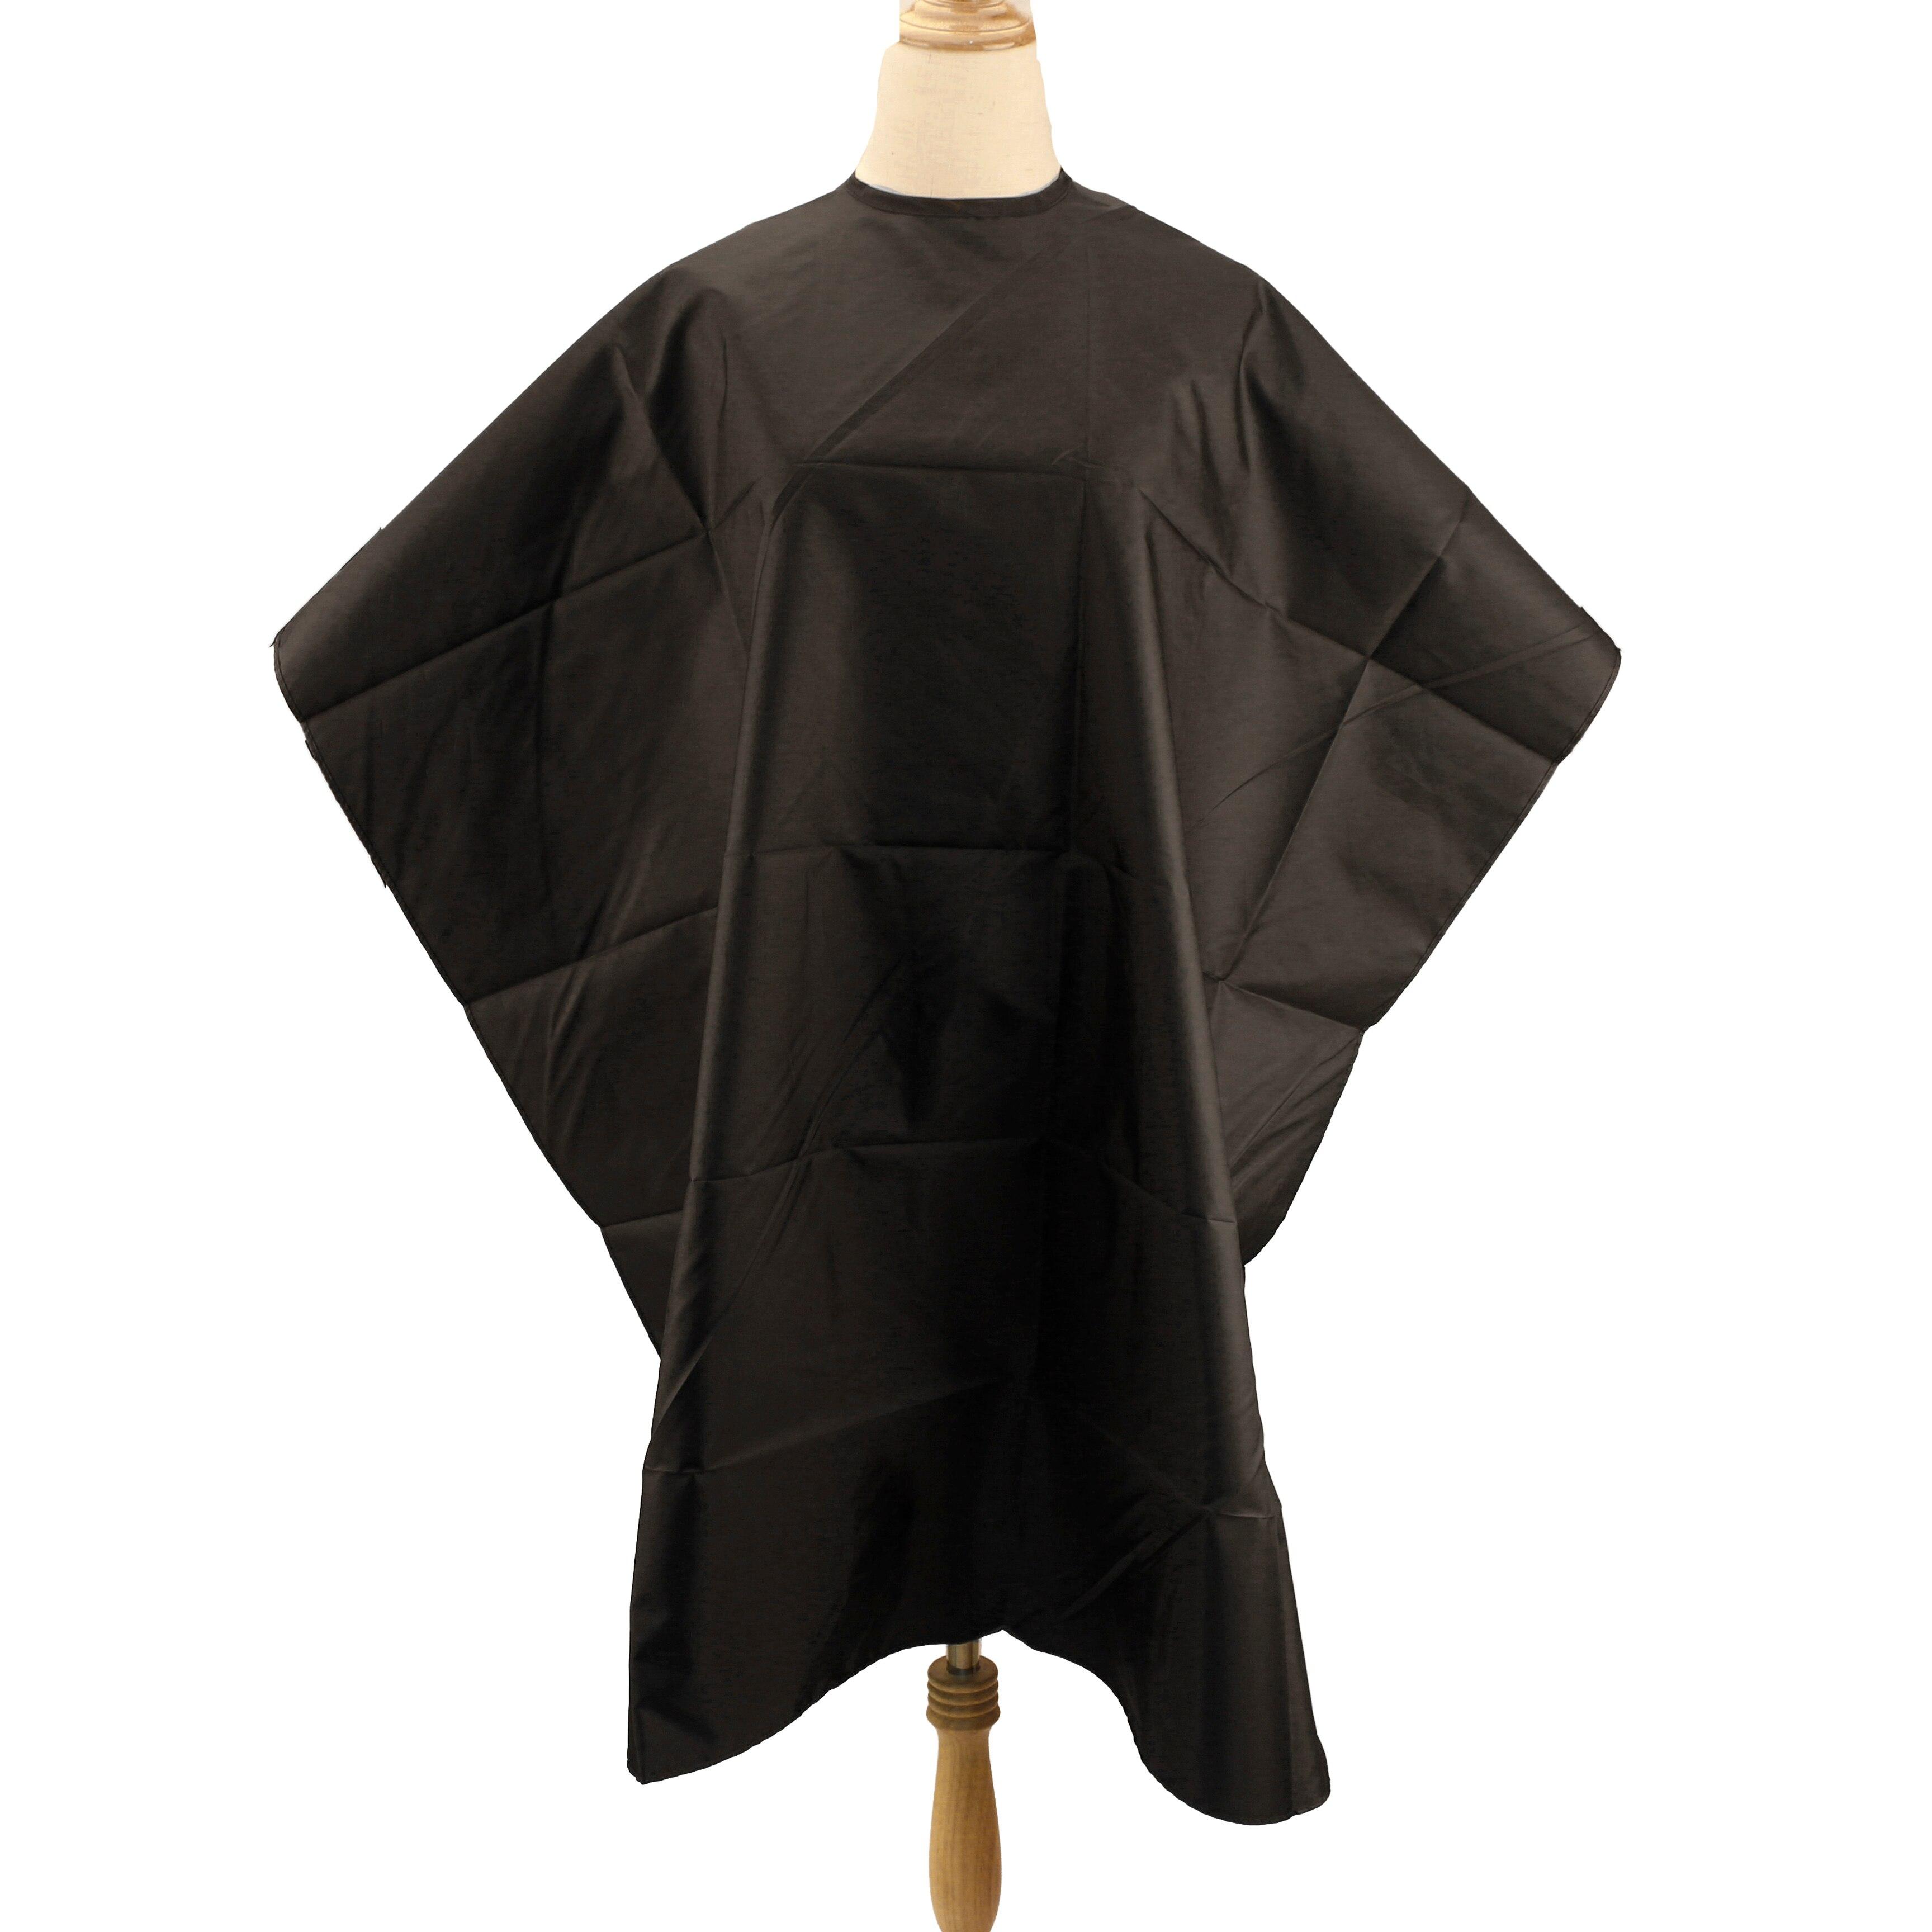 CAPA para peluquería de color negro liso capa para peluquería antiestática para adultos envoltura de peluquería de poliéster ligero corte de pelo bata capa para salón de belleza